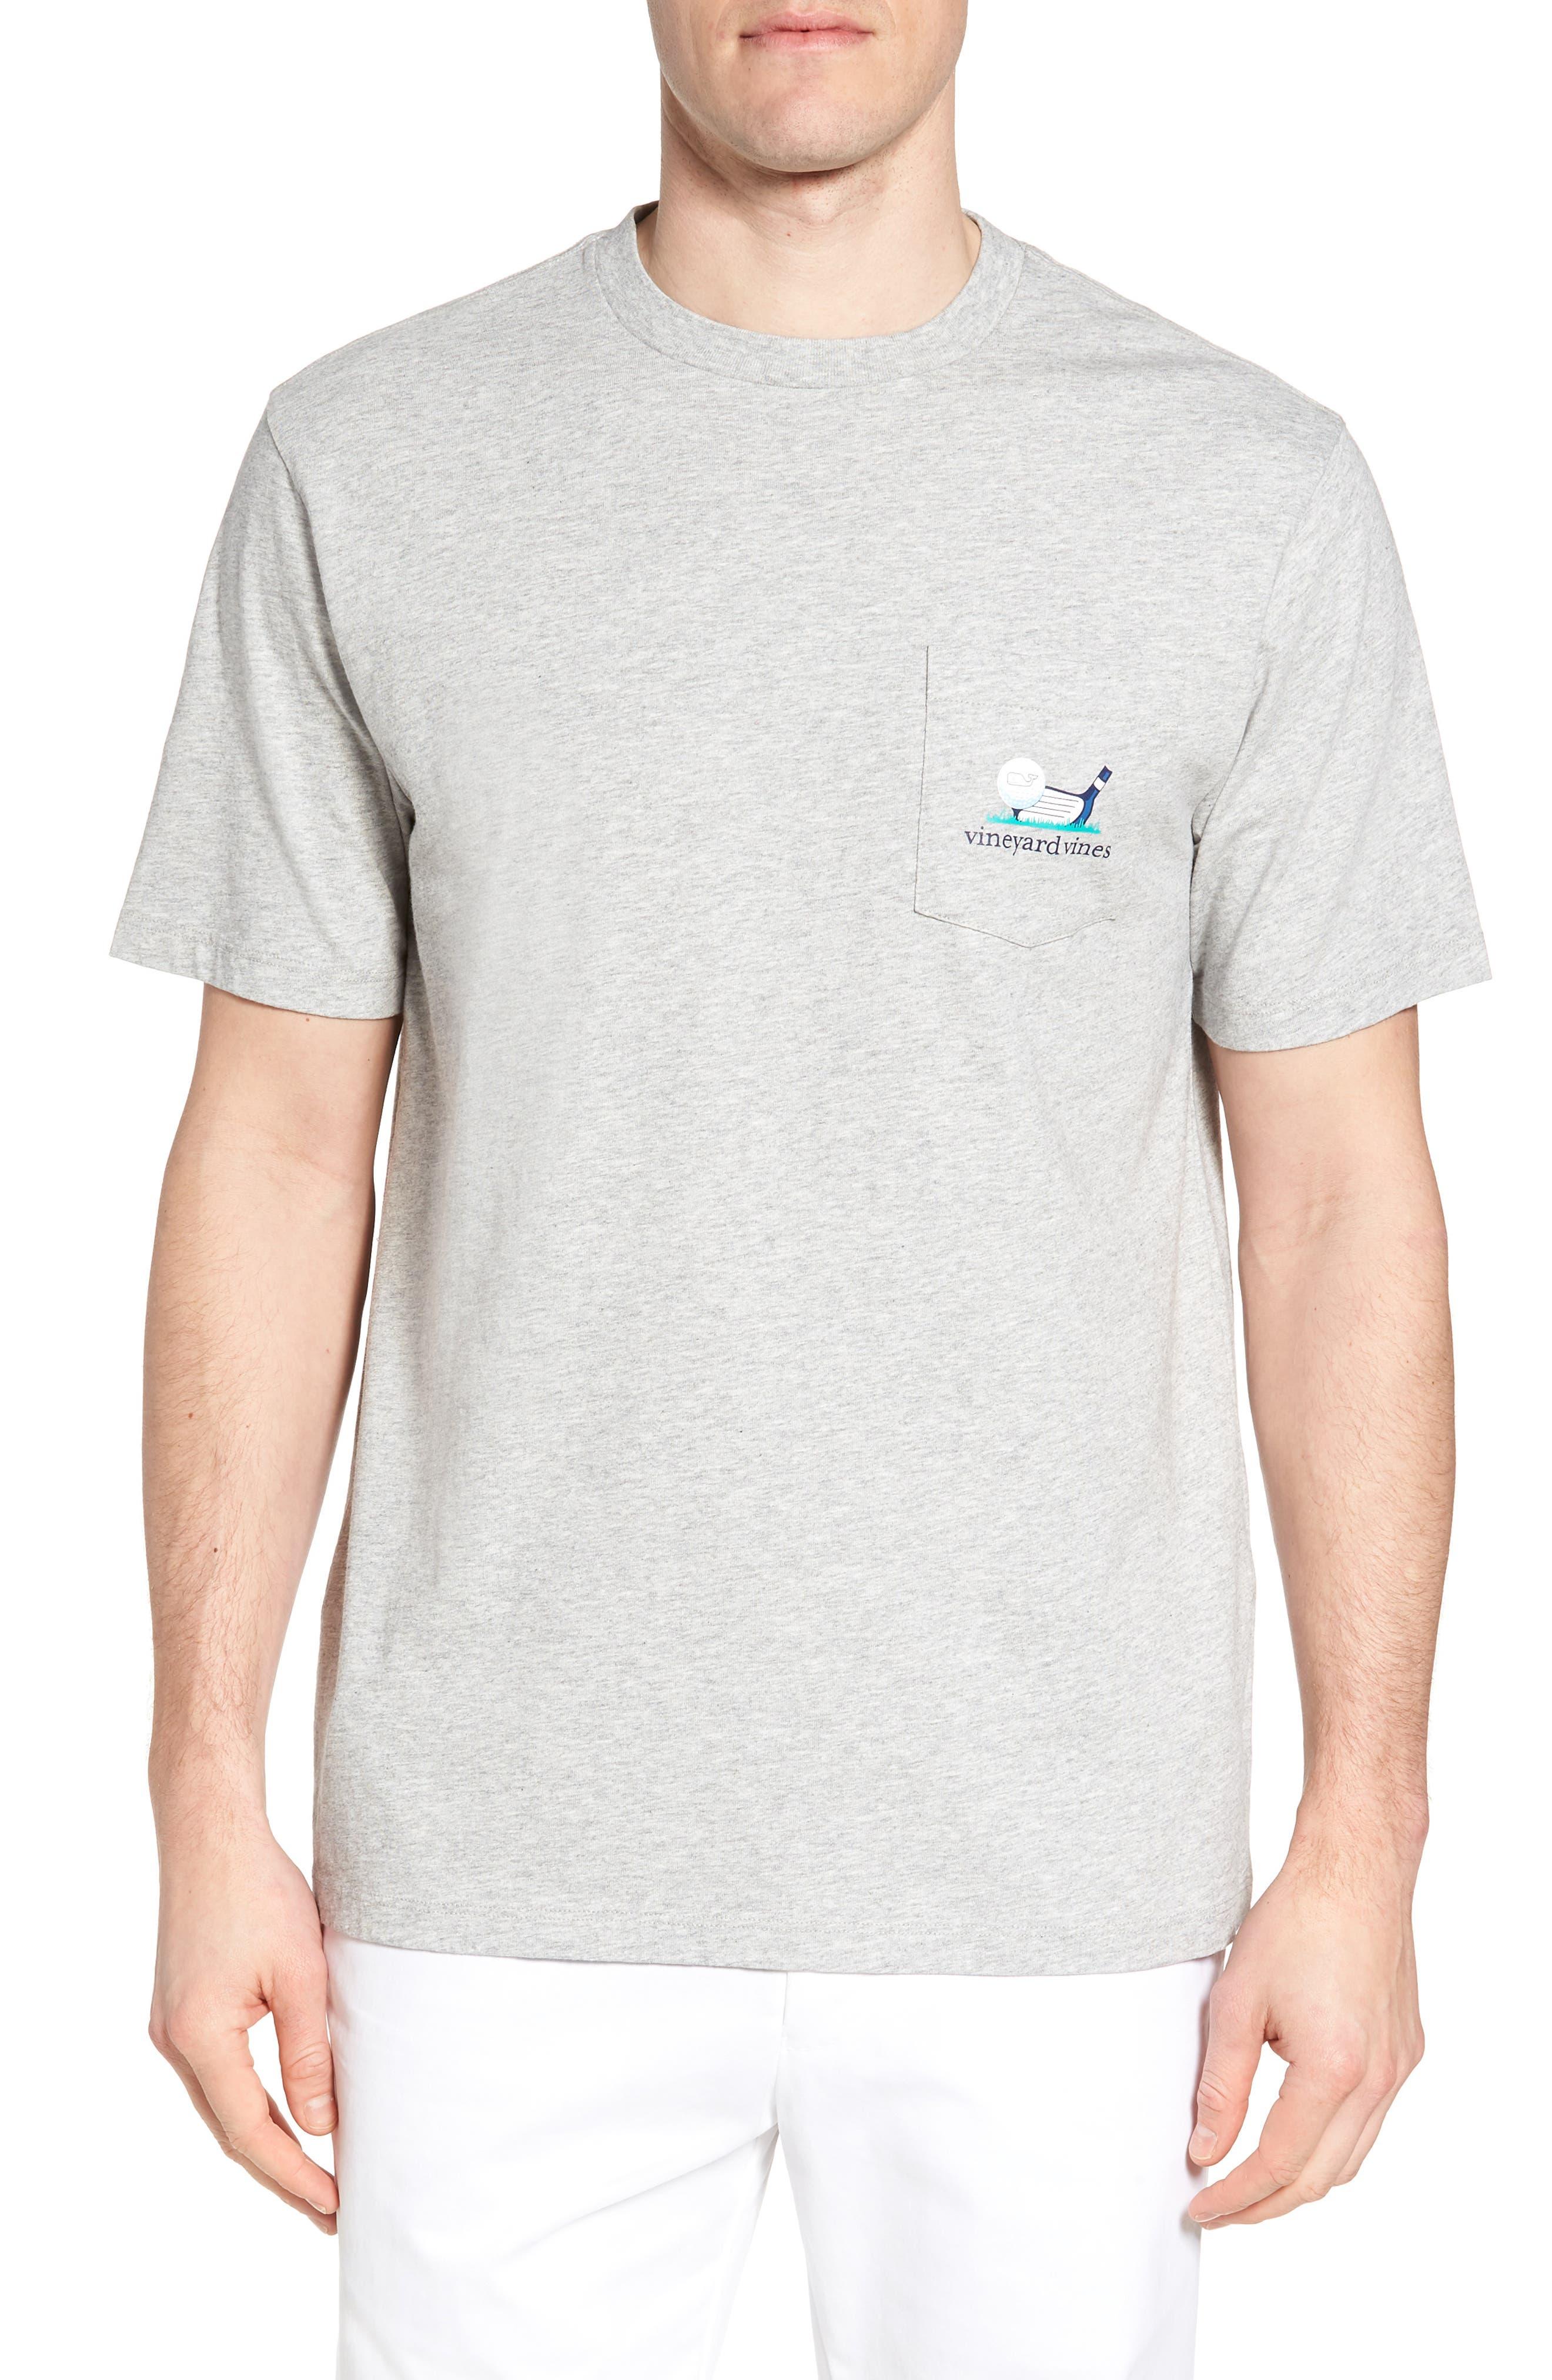 Main Image - vineyard vines Regular Fit Golf T-Shirt